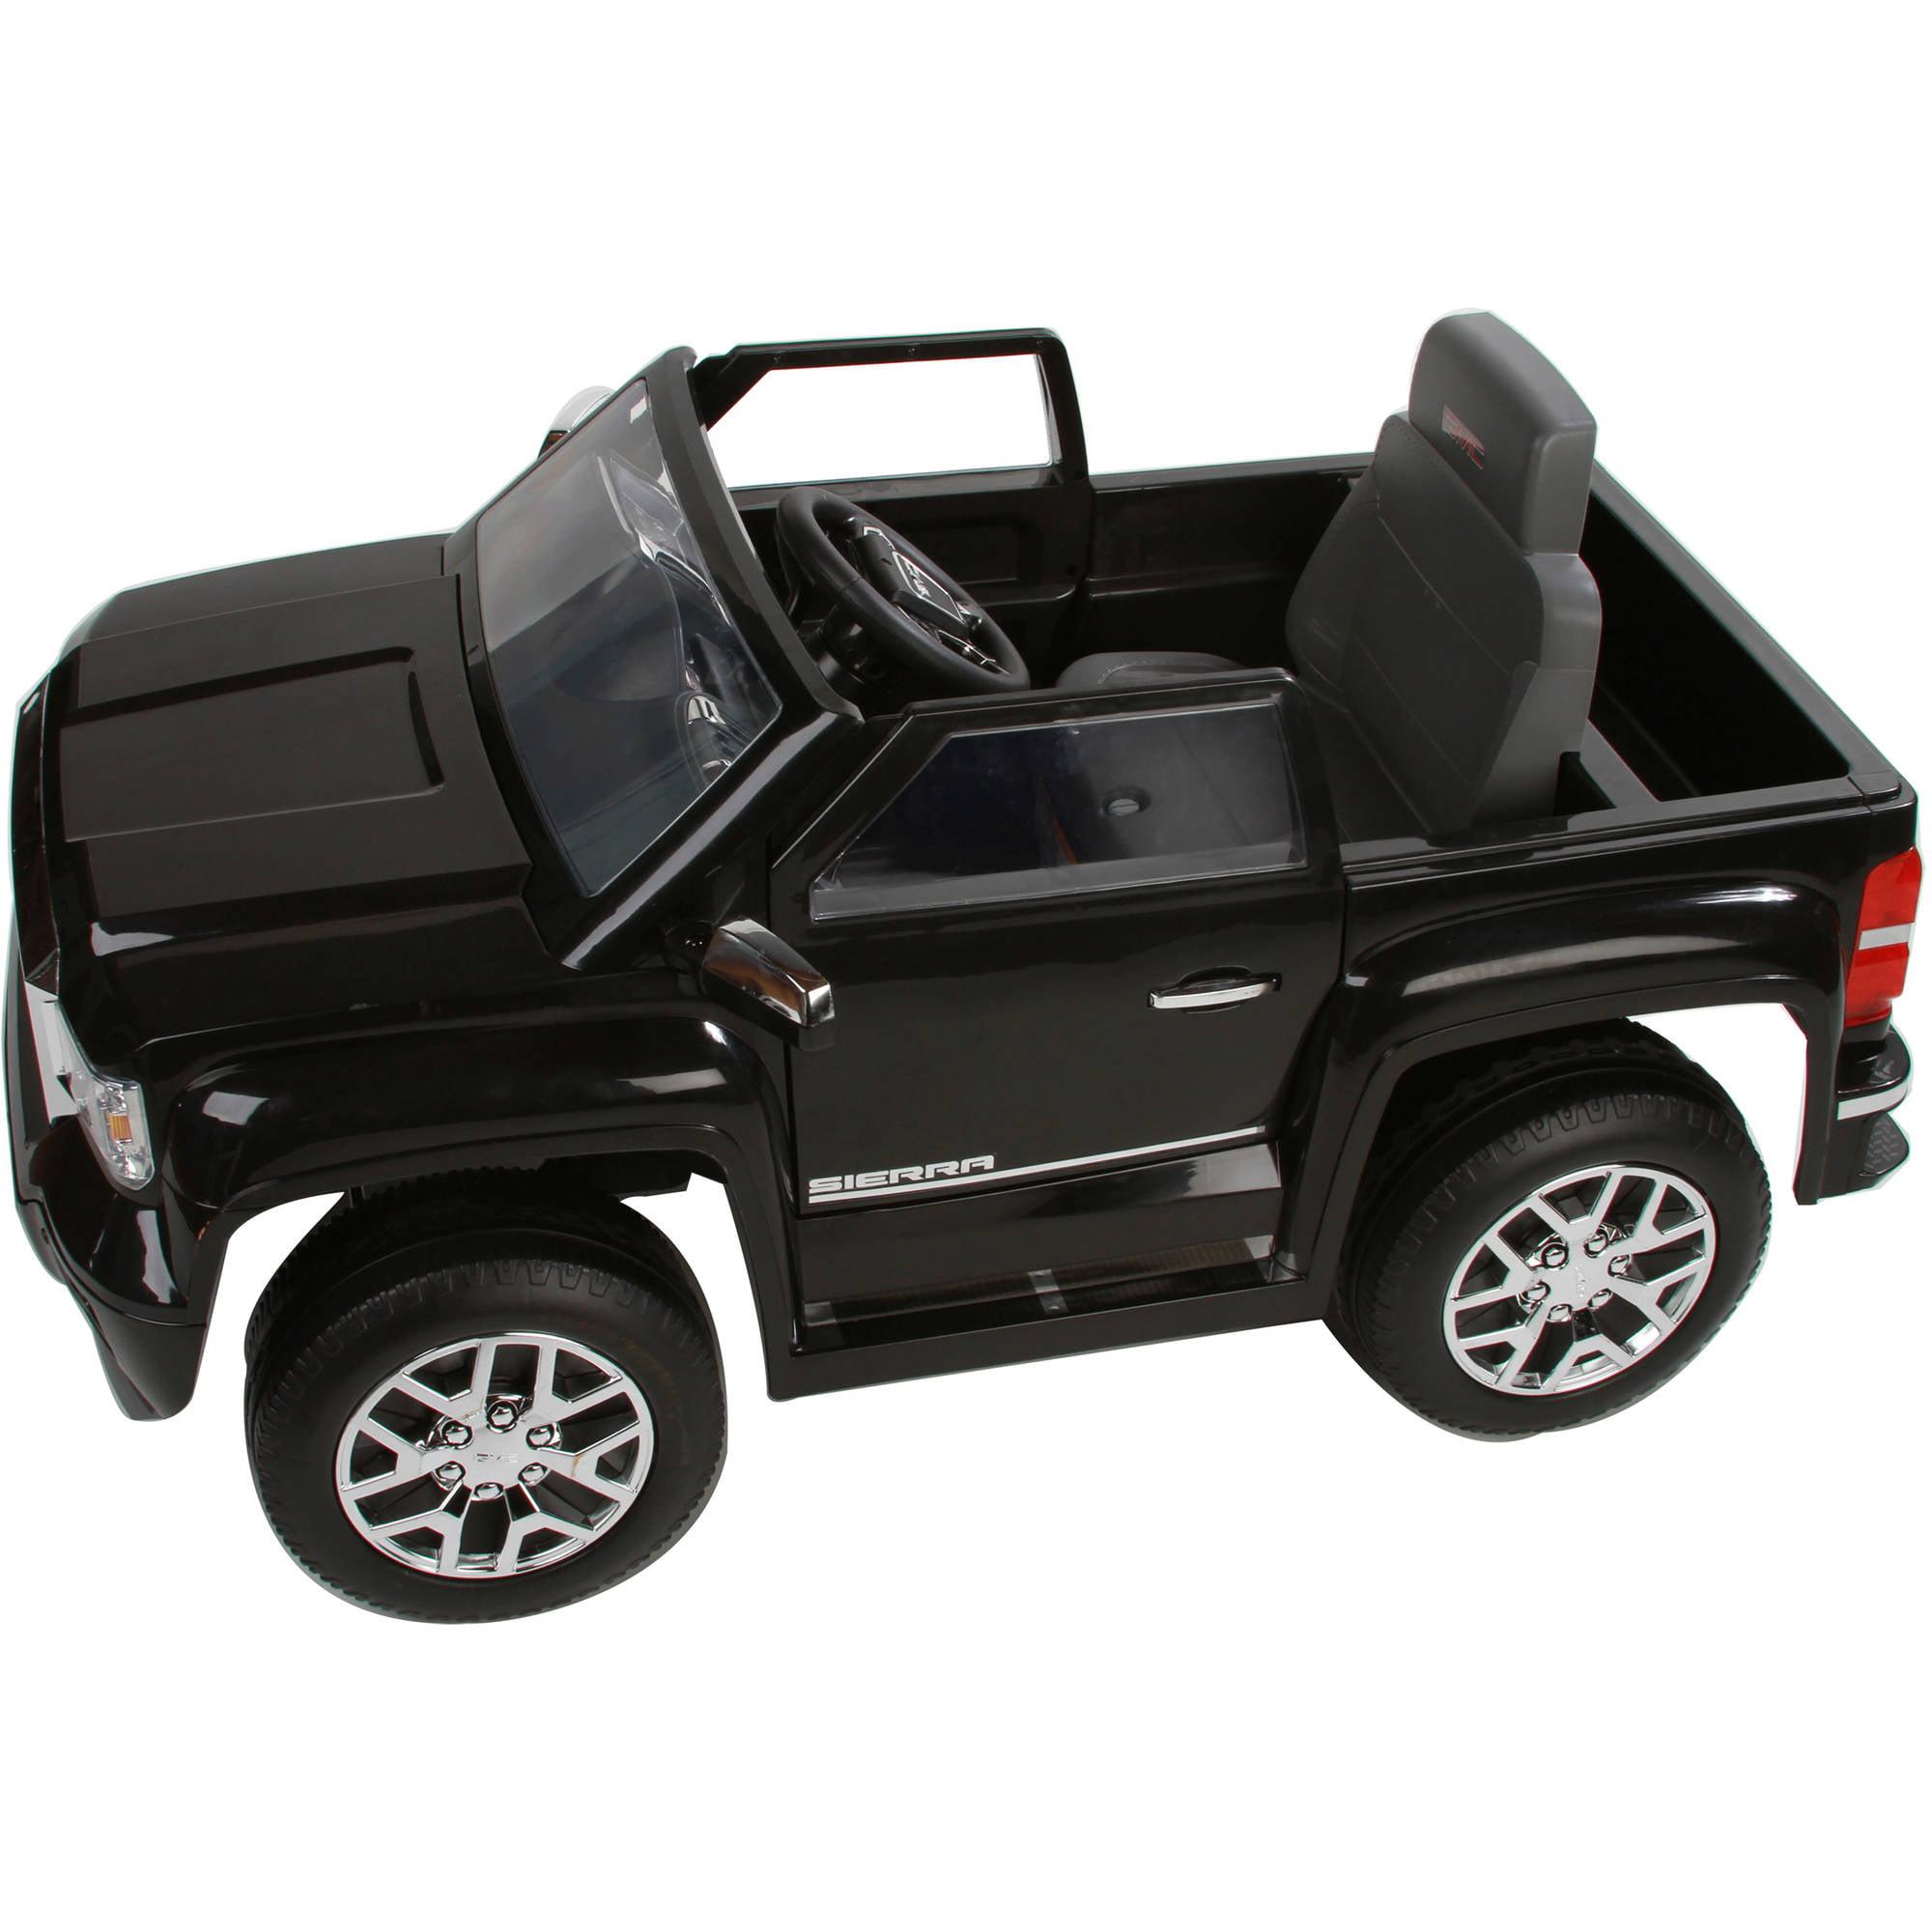 Rollplay Gmc Sierra 6 Volt Pickup Battery Ride On Vehicle Walmart Com Walmart Com